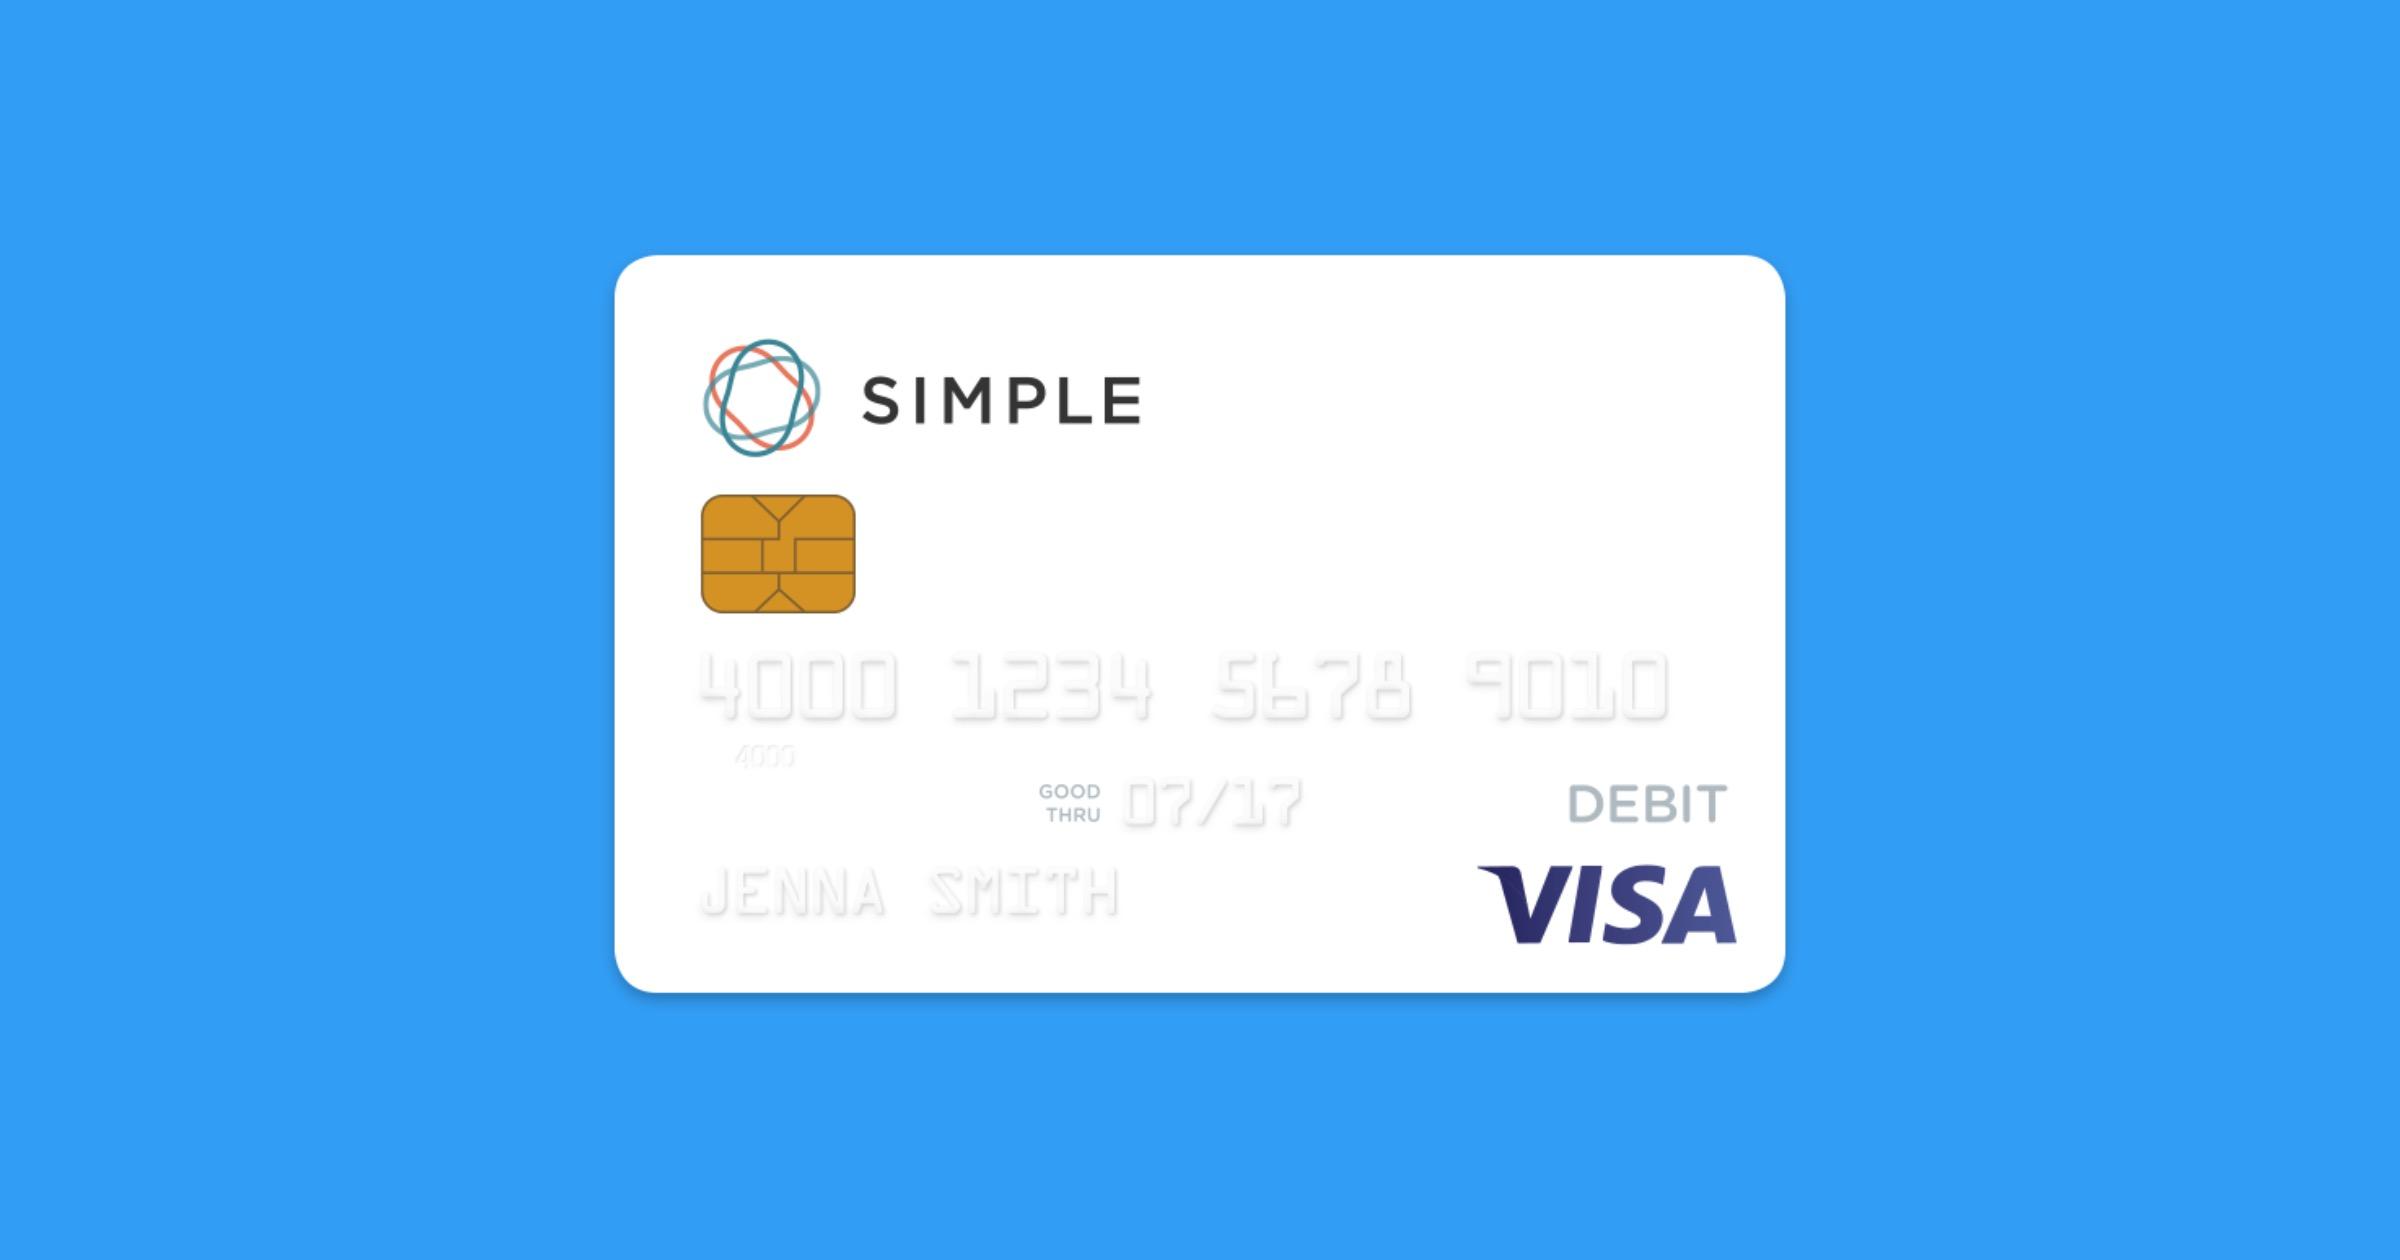 Simple banking debit card